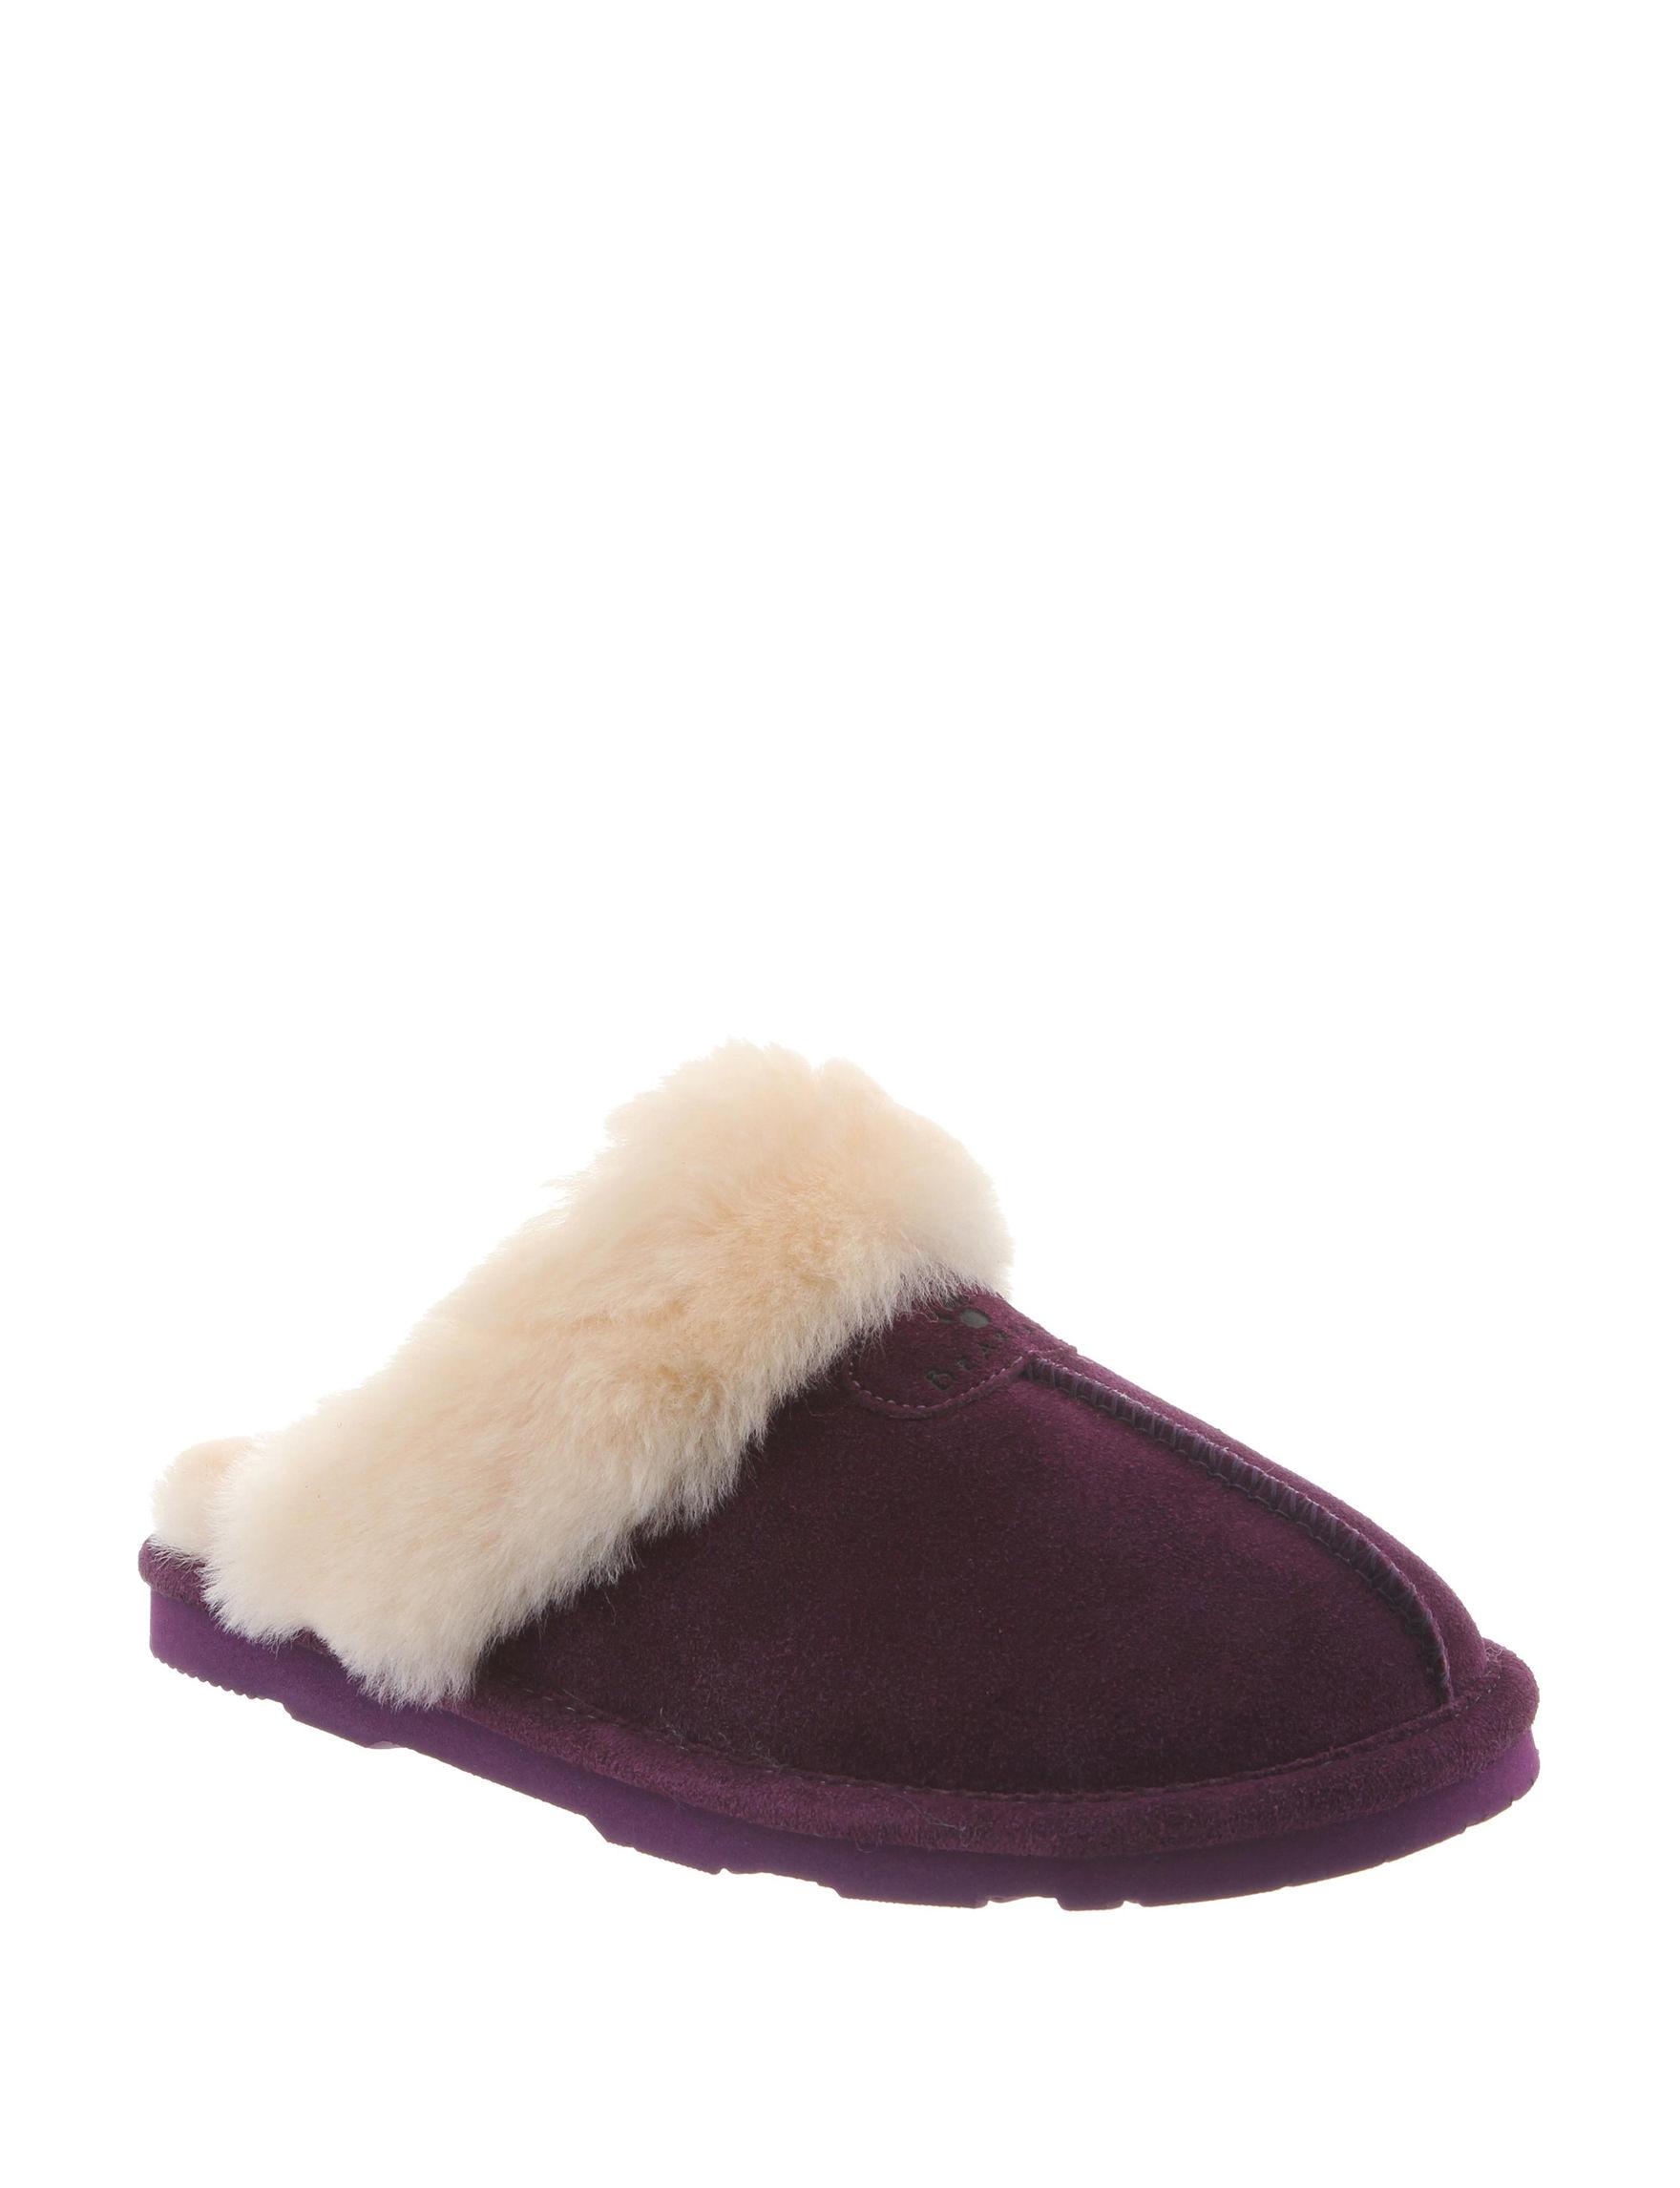 Bearpaw Plum Slipper Shoes